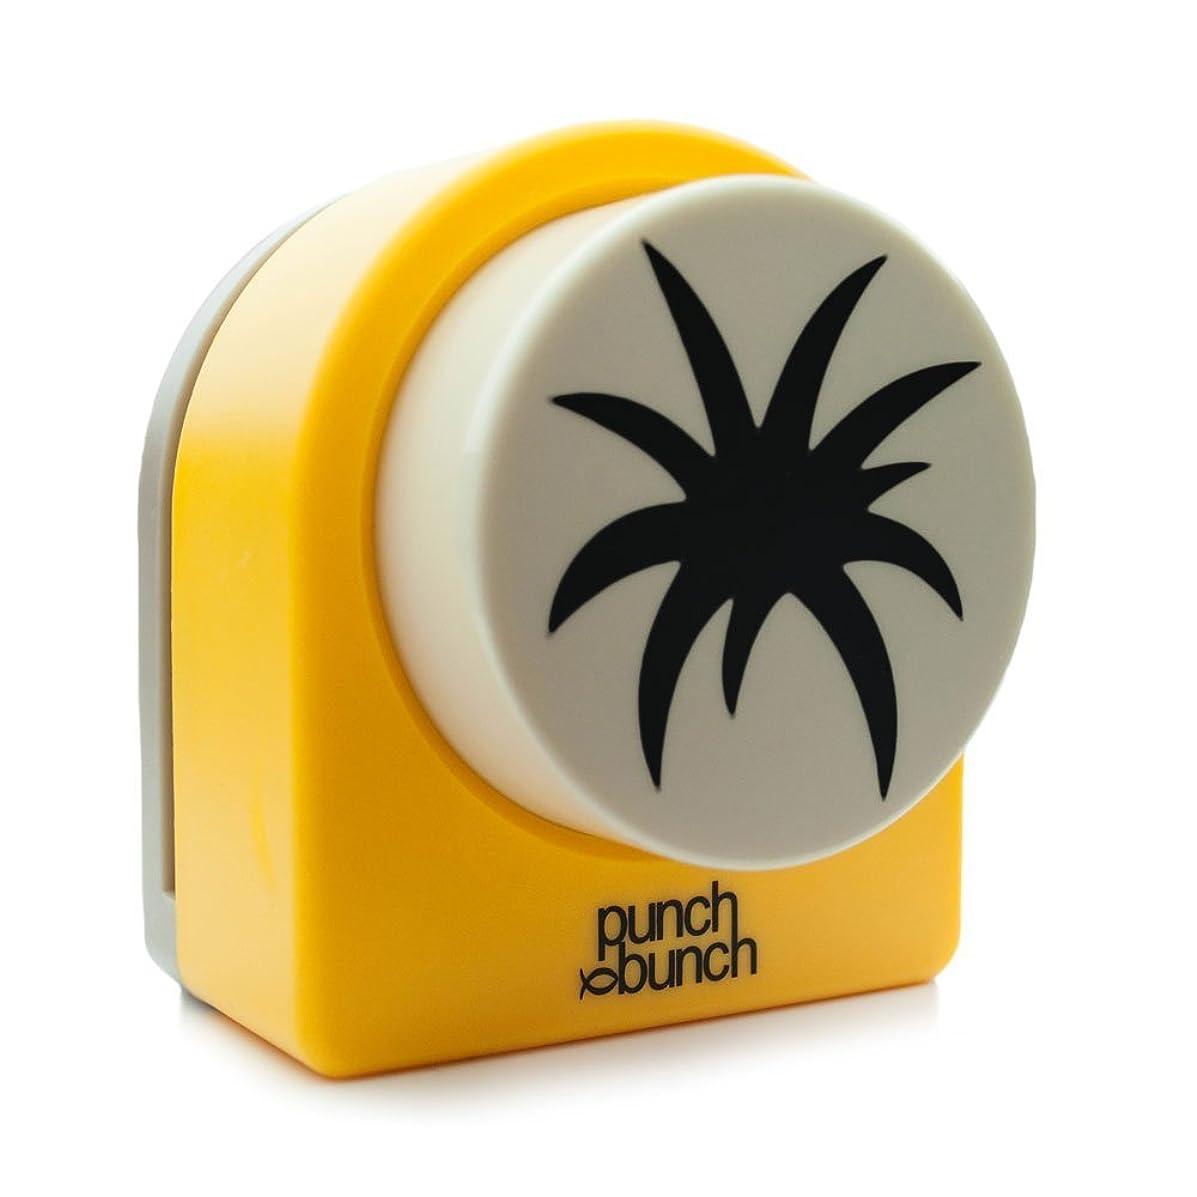 Punch Bunch Super Giant Punch, Burst